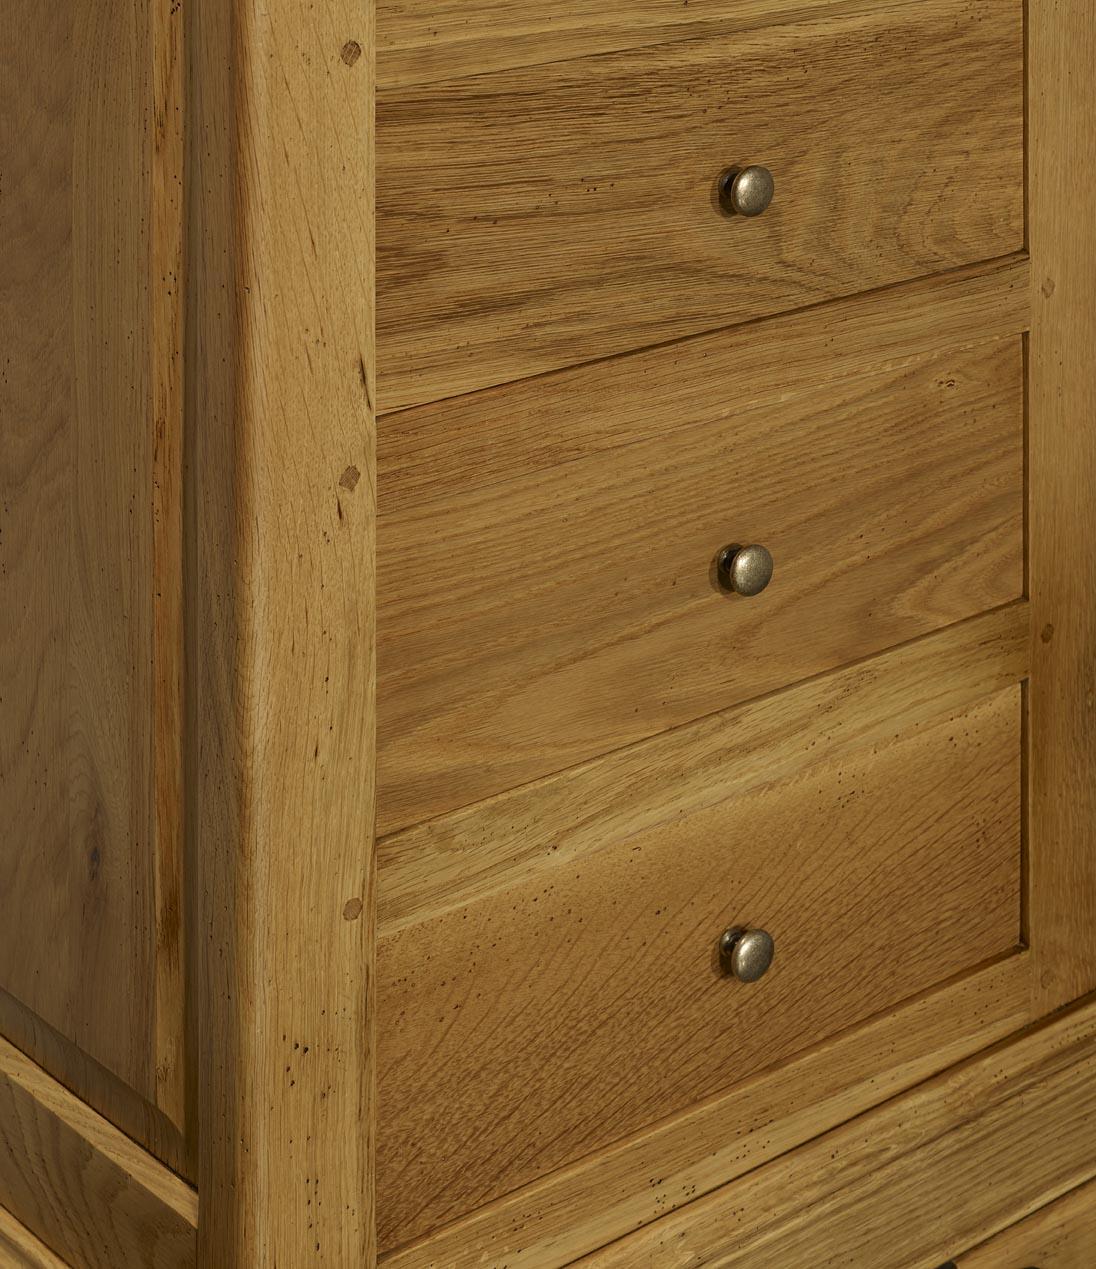 chiffonnier 5 tiroirs en ch ne massif de style louis philippe meuble en ch ne. Black Bedroom Furniture Sets. Home Design Ideas